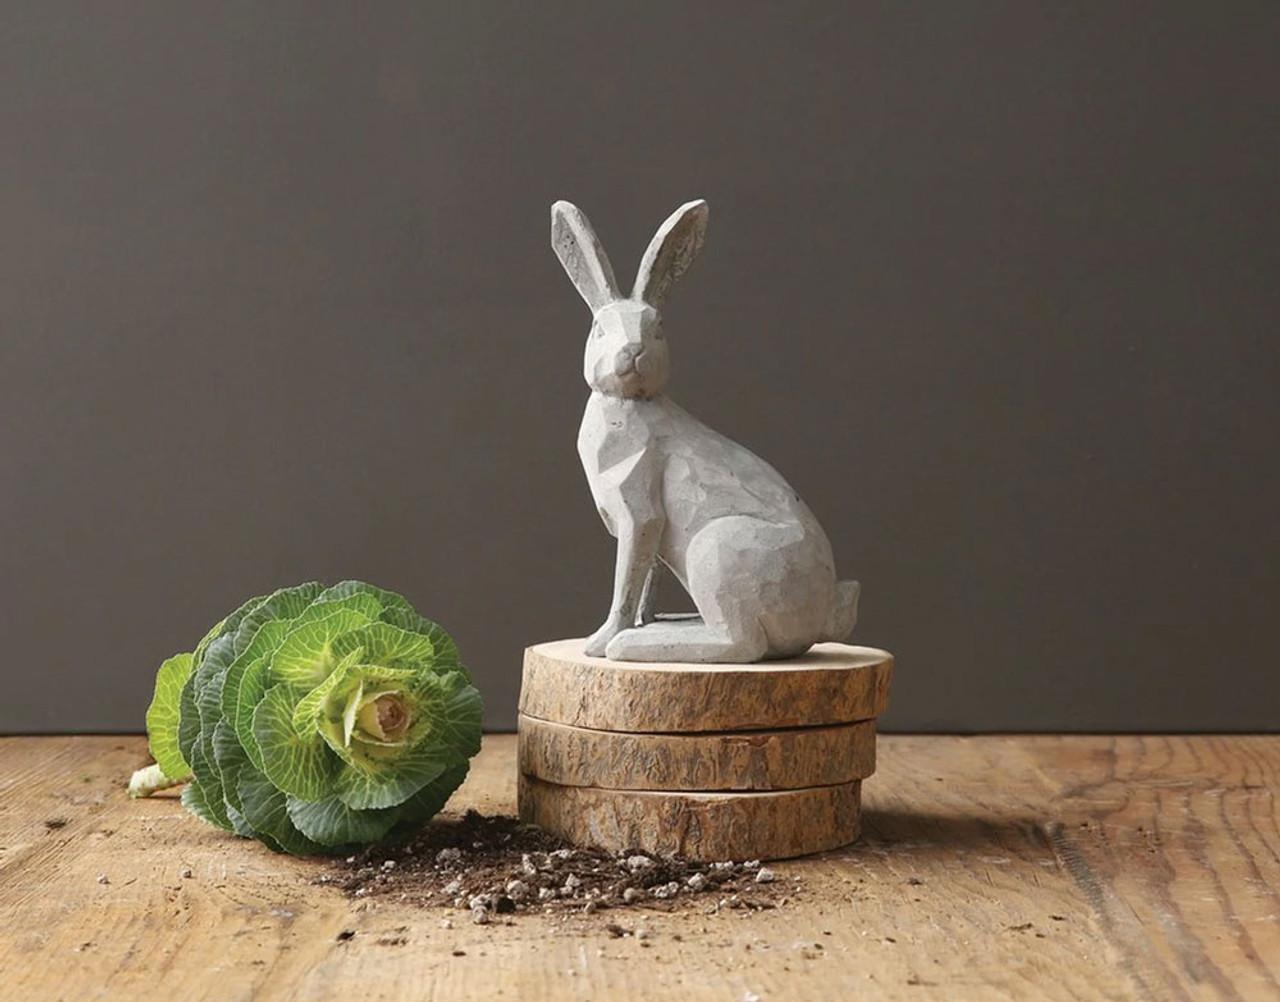 Cute, Farmhouse Inspired Easter Decor Ideas